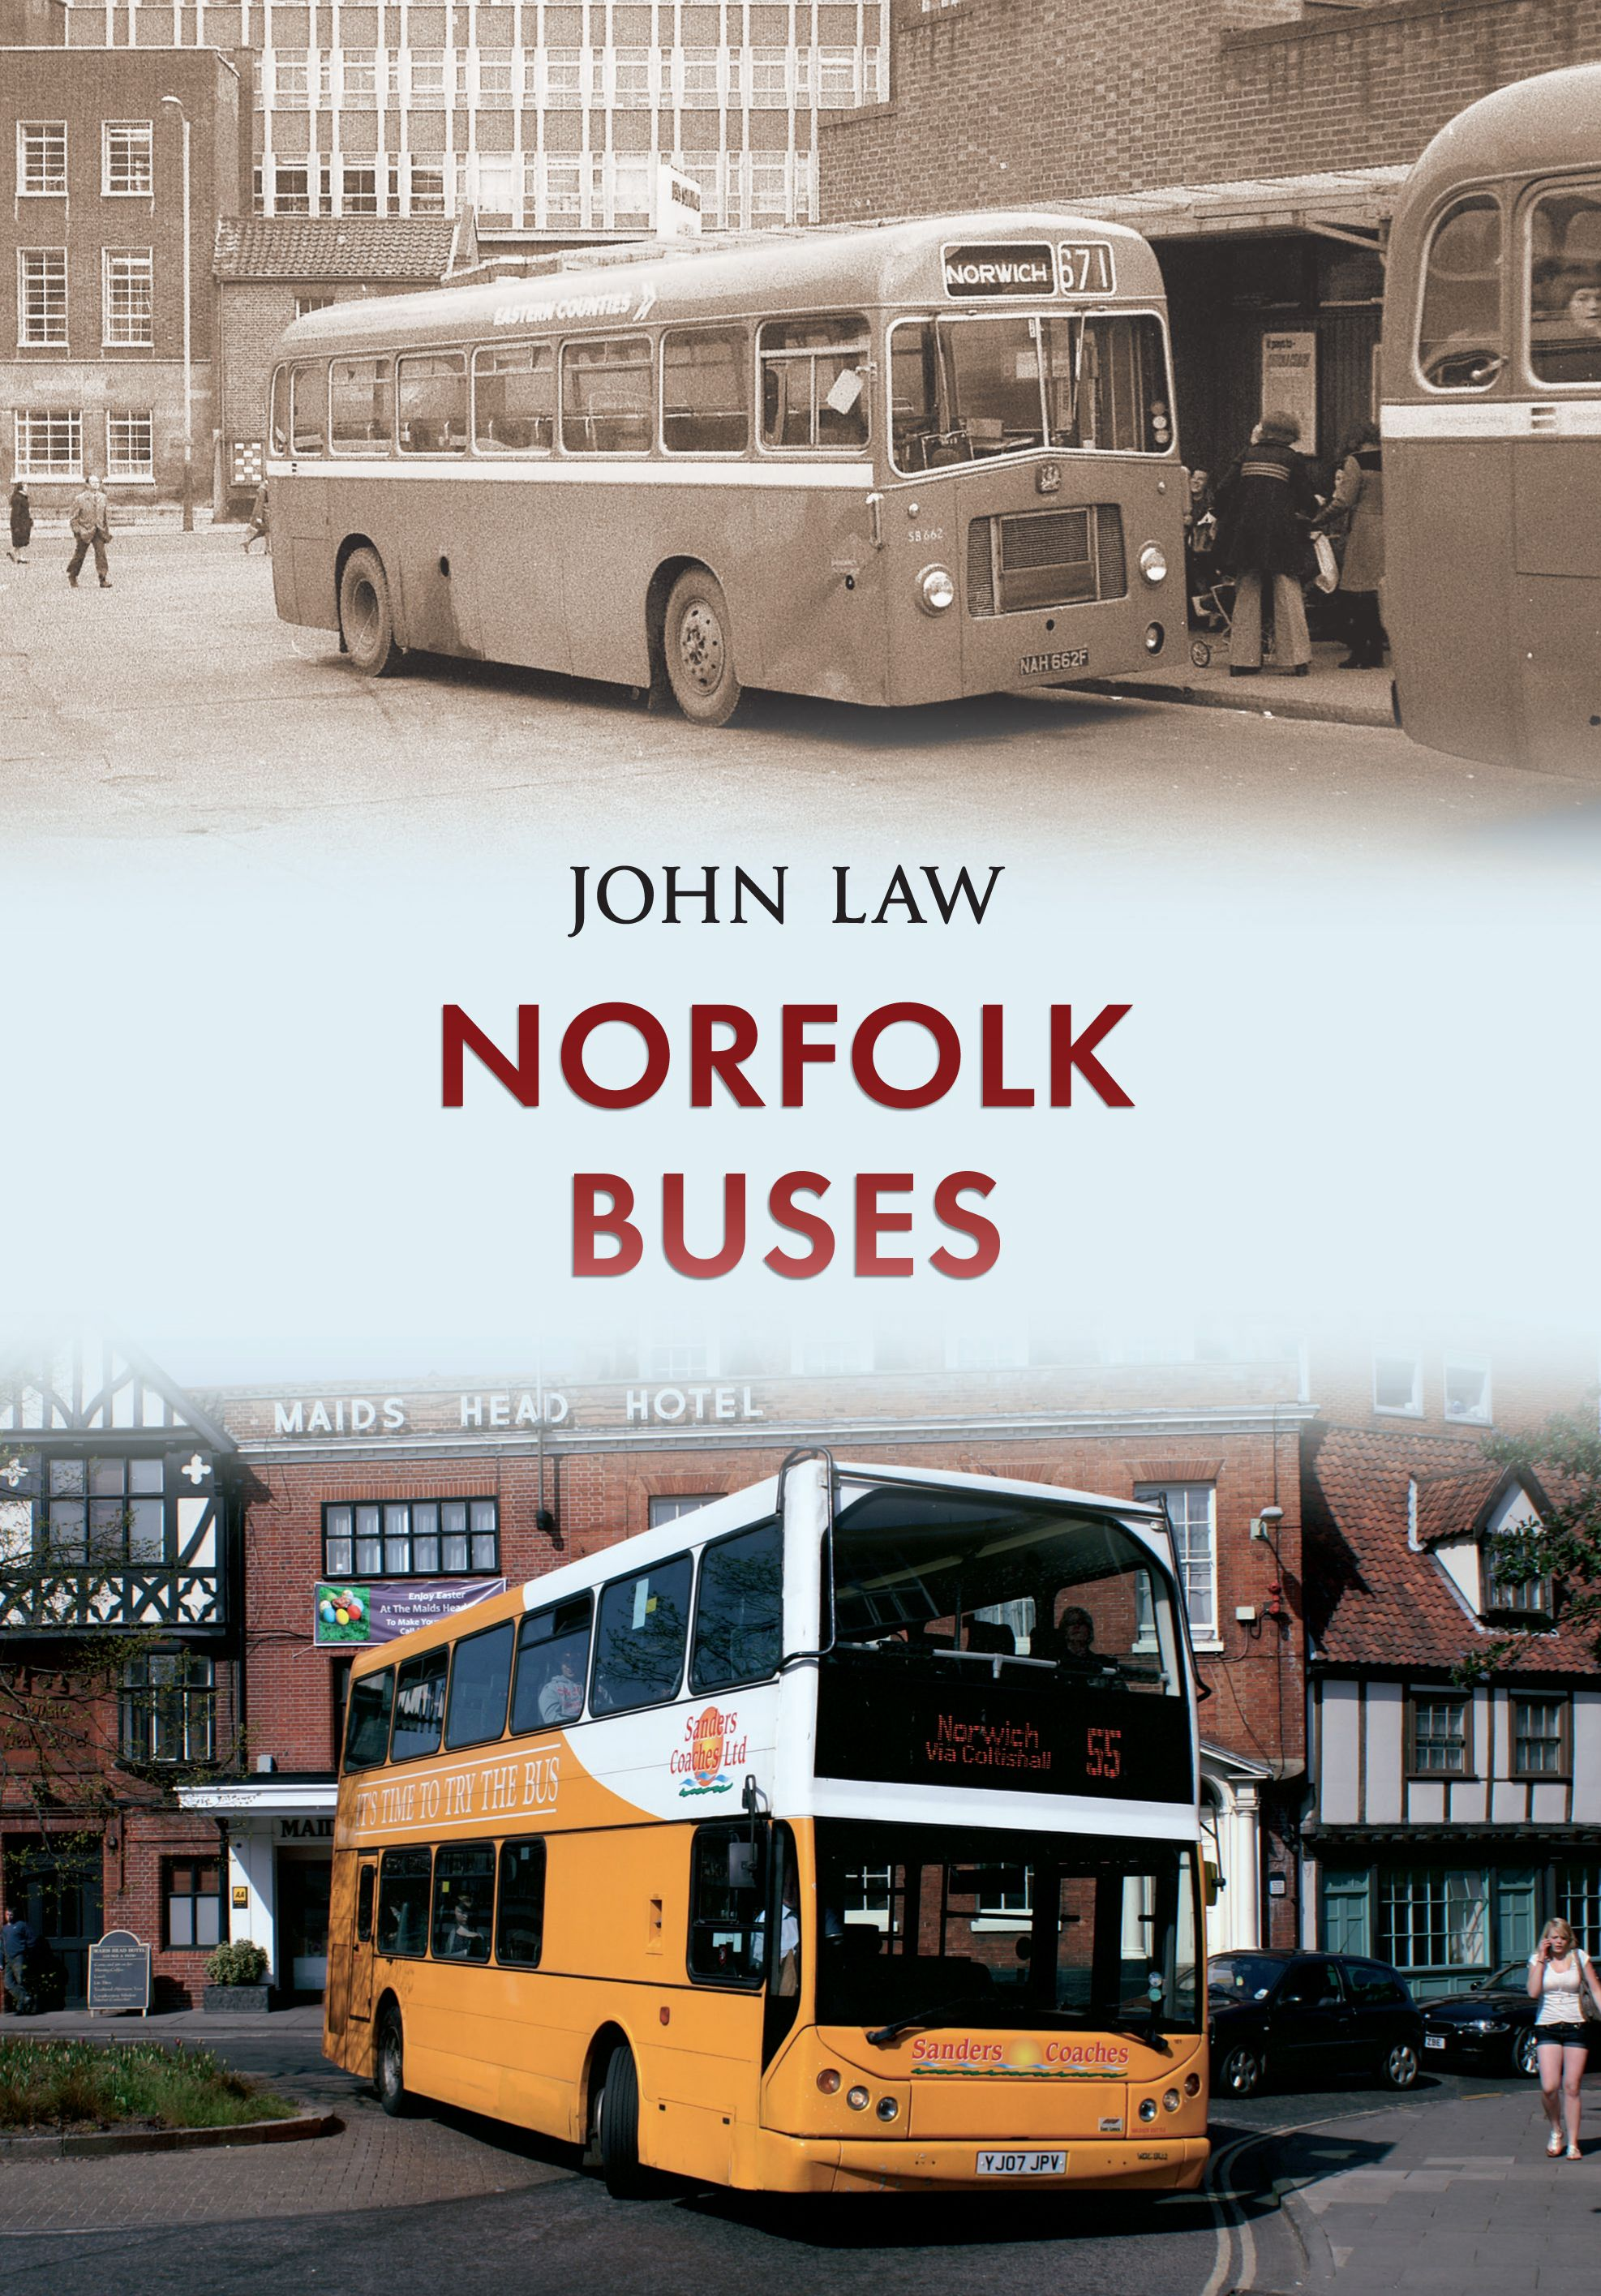 Norfolk Buses Norfolk, Great yarmouth, John law